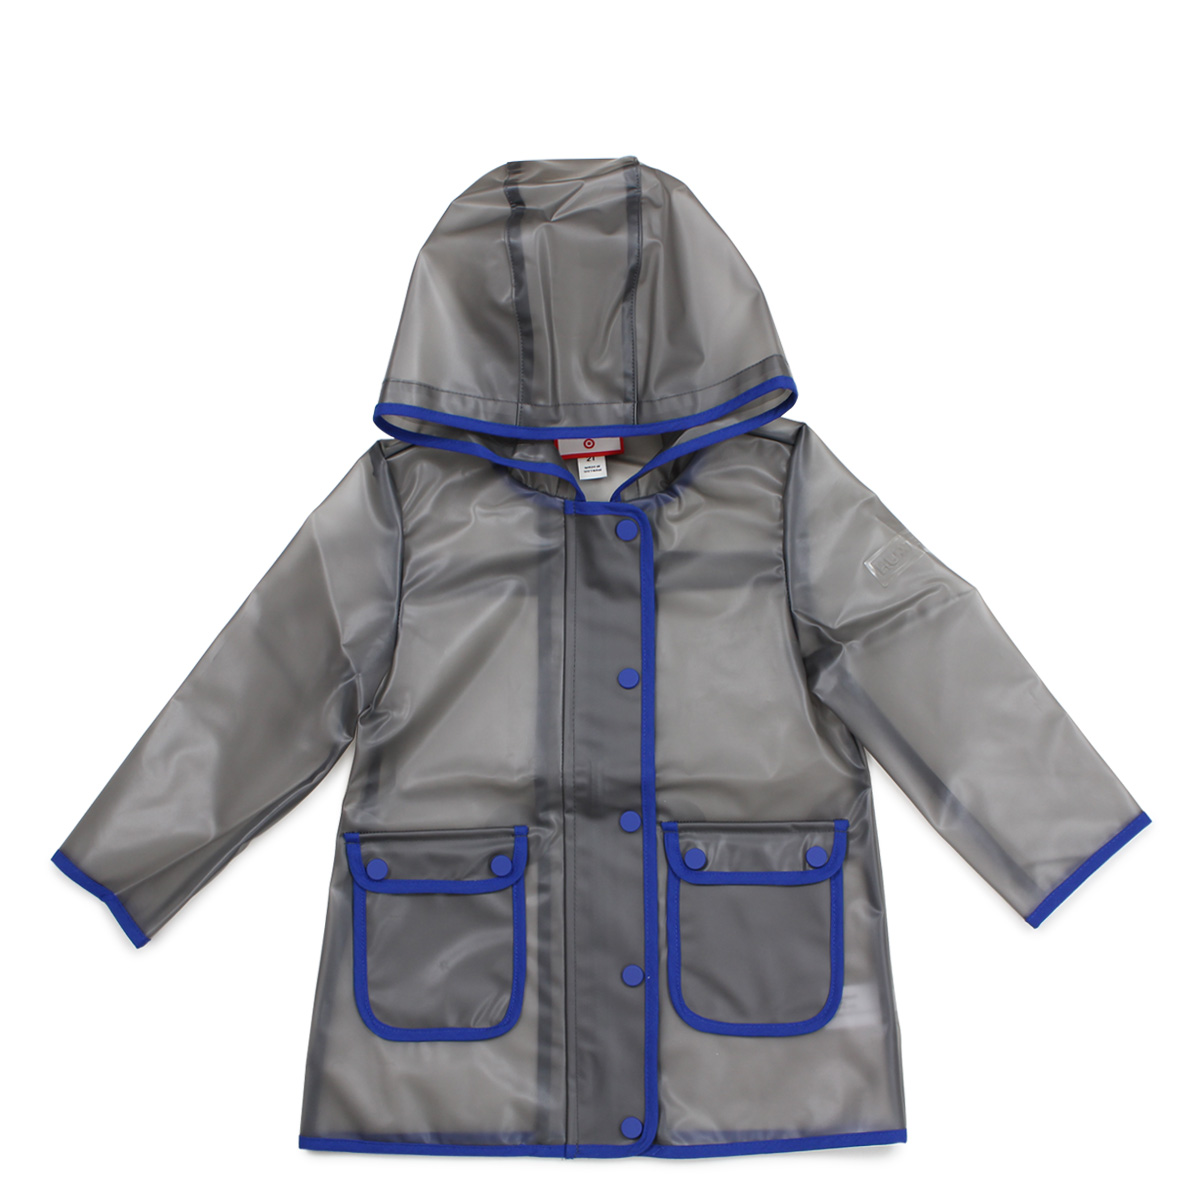 5575b2fc4aa1c HUNTER TODDLERS' RAIN COAT hunter raincoat kids rain jacket rain outfit target  TARGET gray 53139 ...